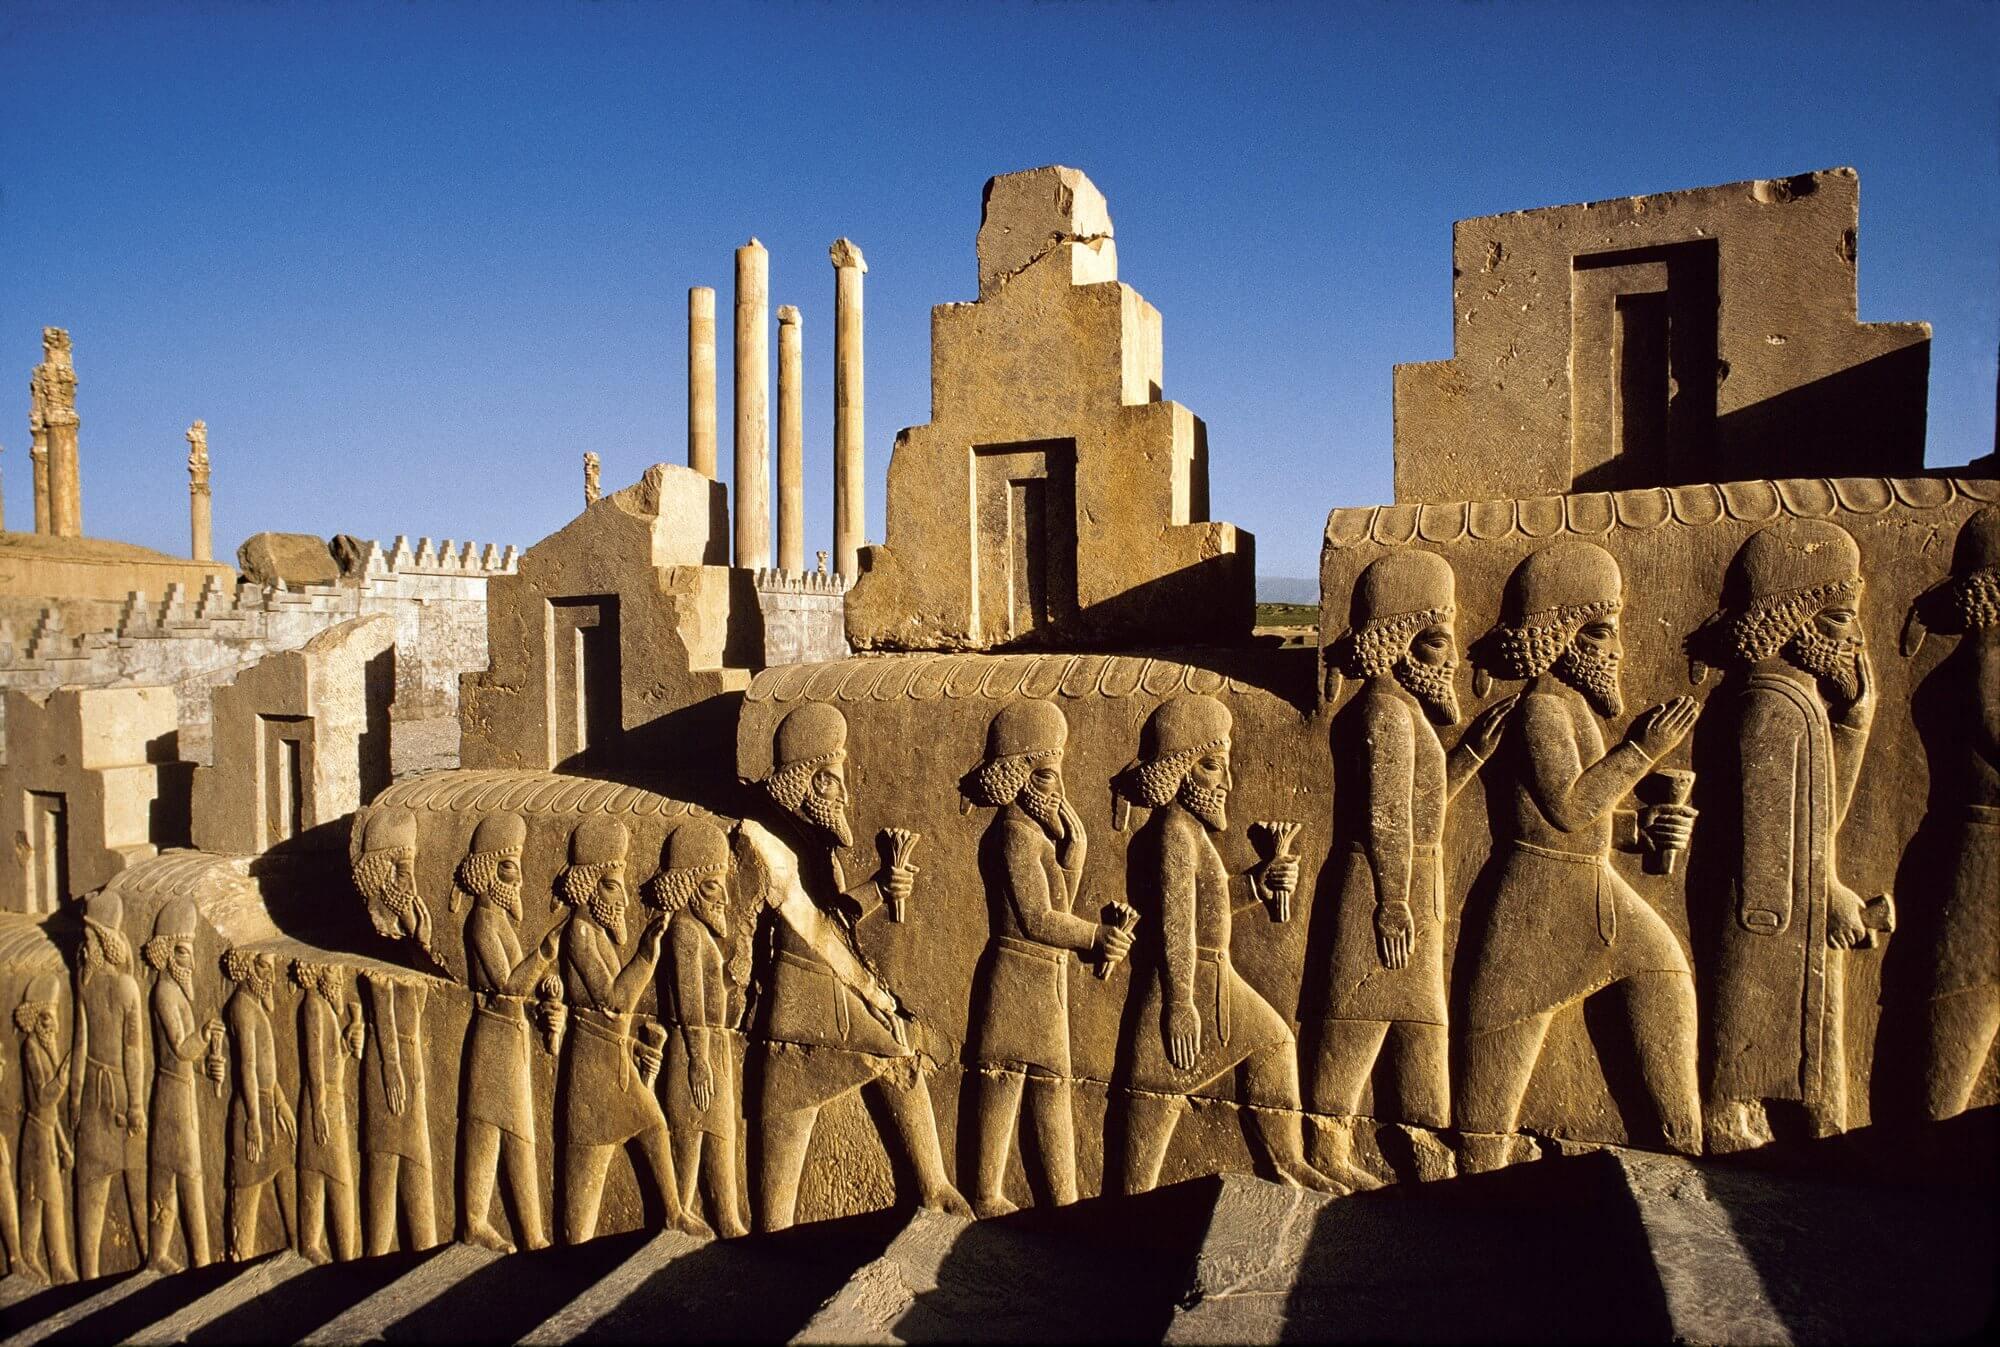 Imperio Aqueménida (550 a. C. - 330 a. C.)